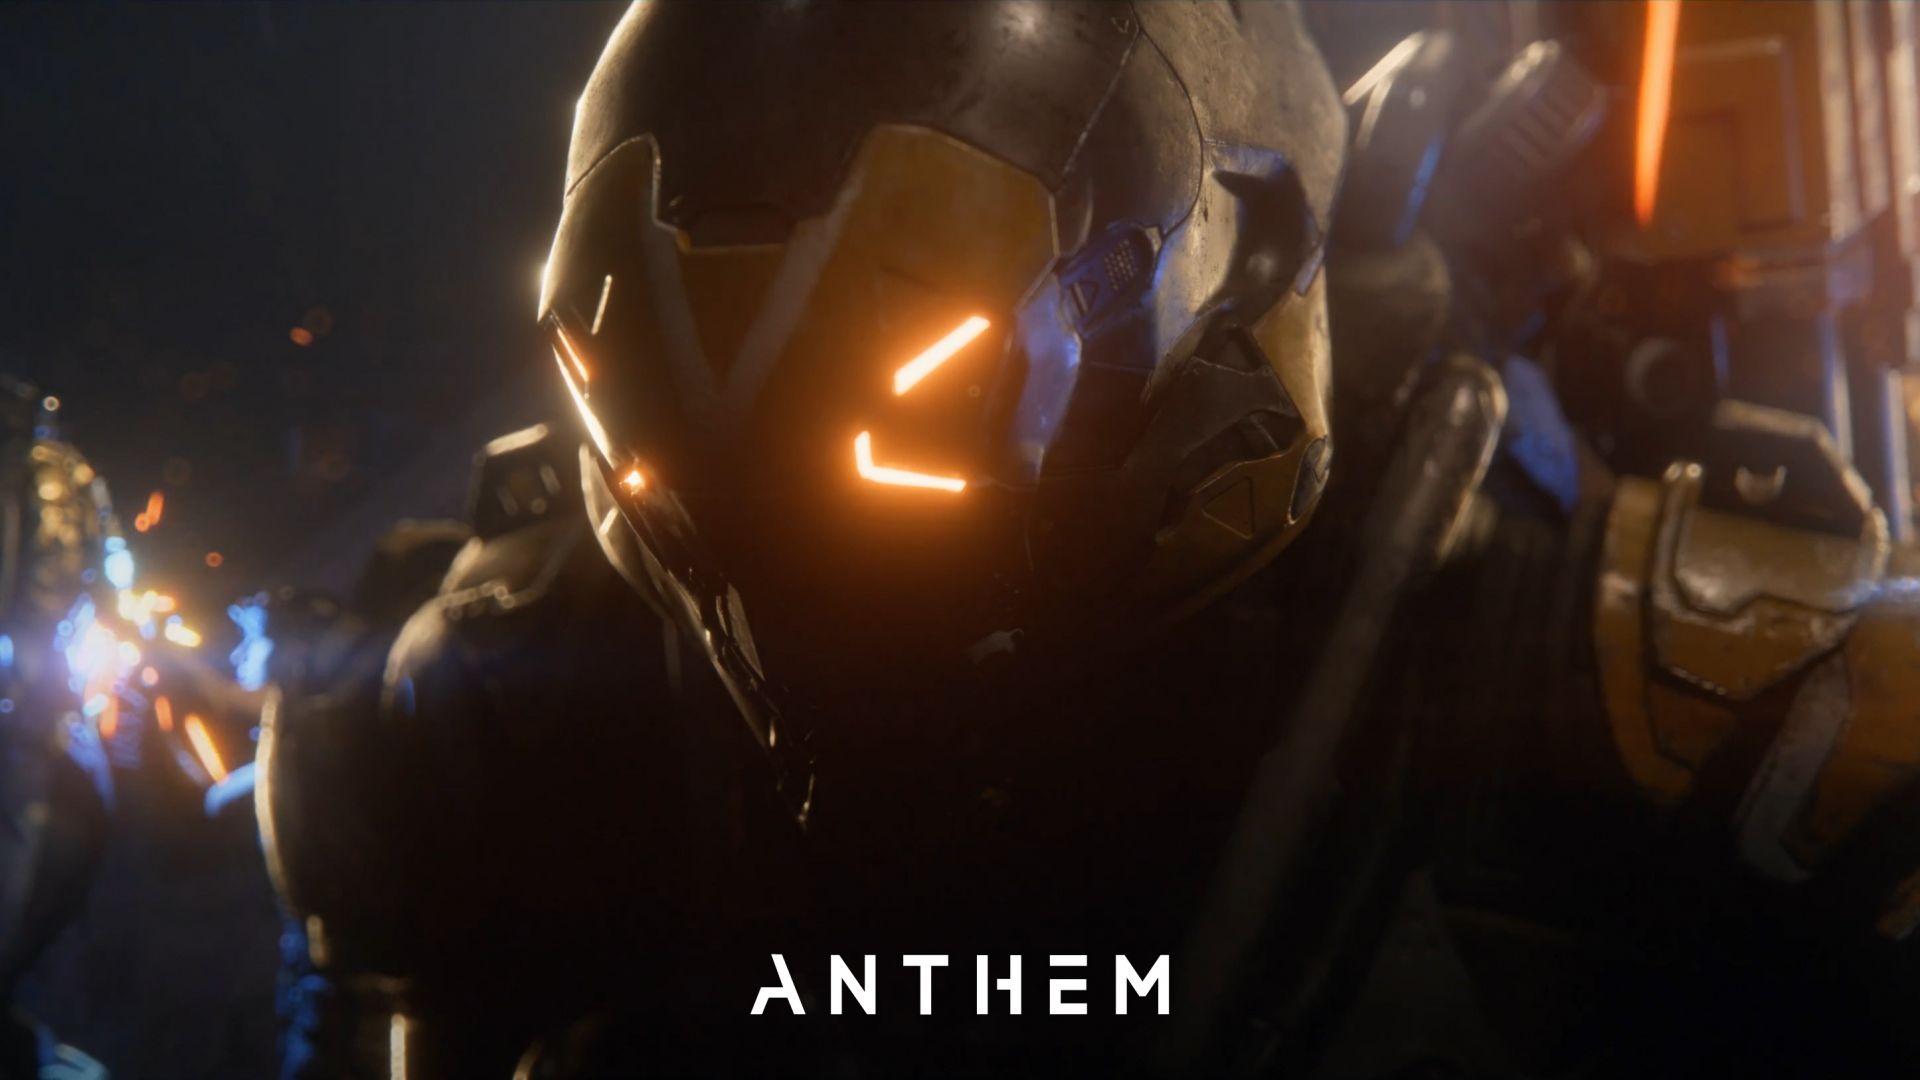 Wallpaper Anthem, 4k, screenshot, gameplay, E3 2017, Games ...